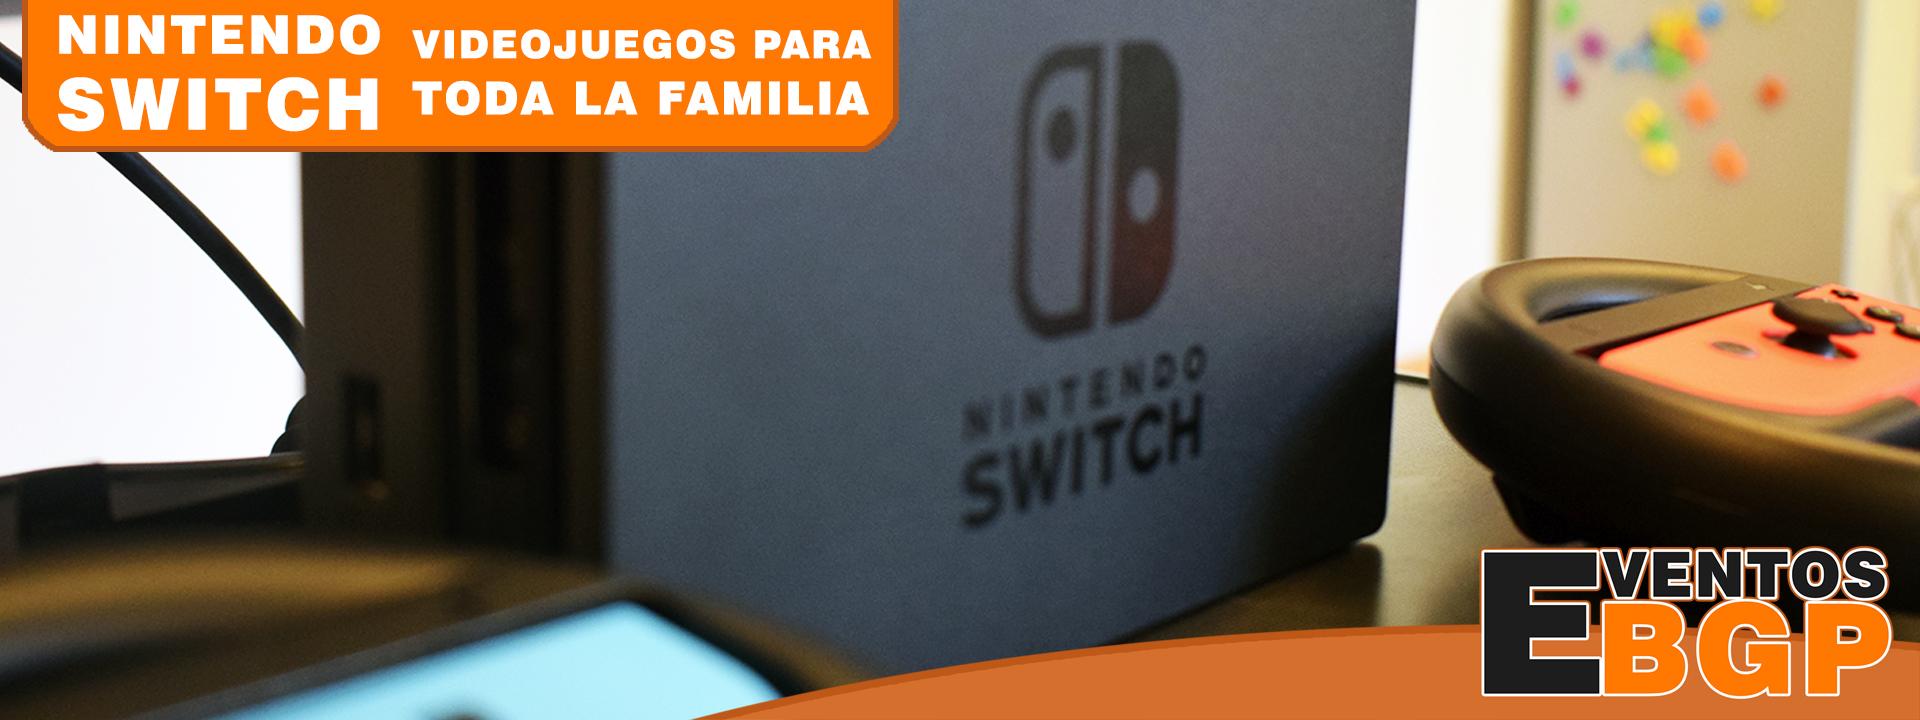 Nintendo Switch alquiler videojuegos para toda la familia